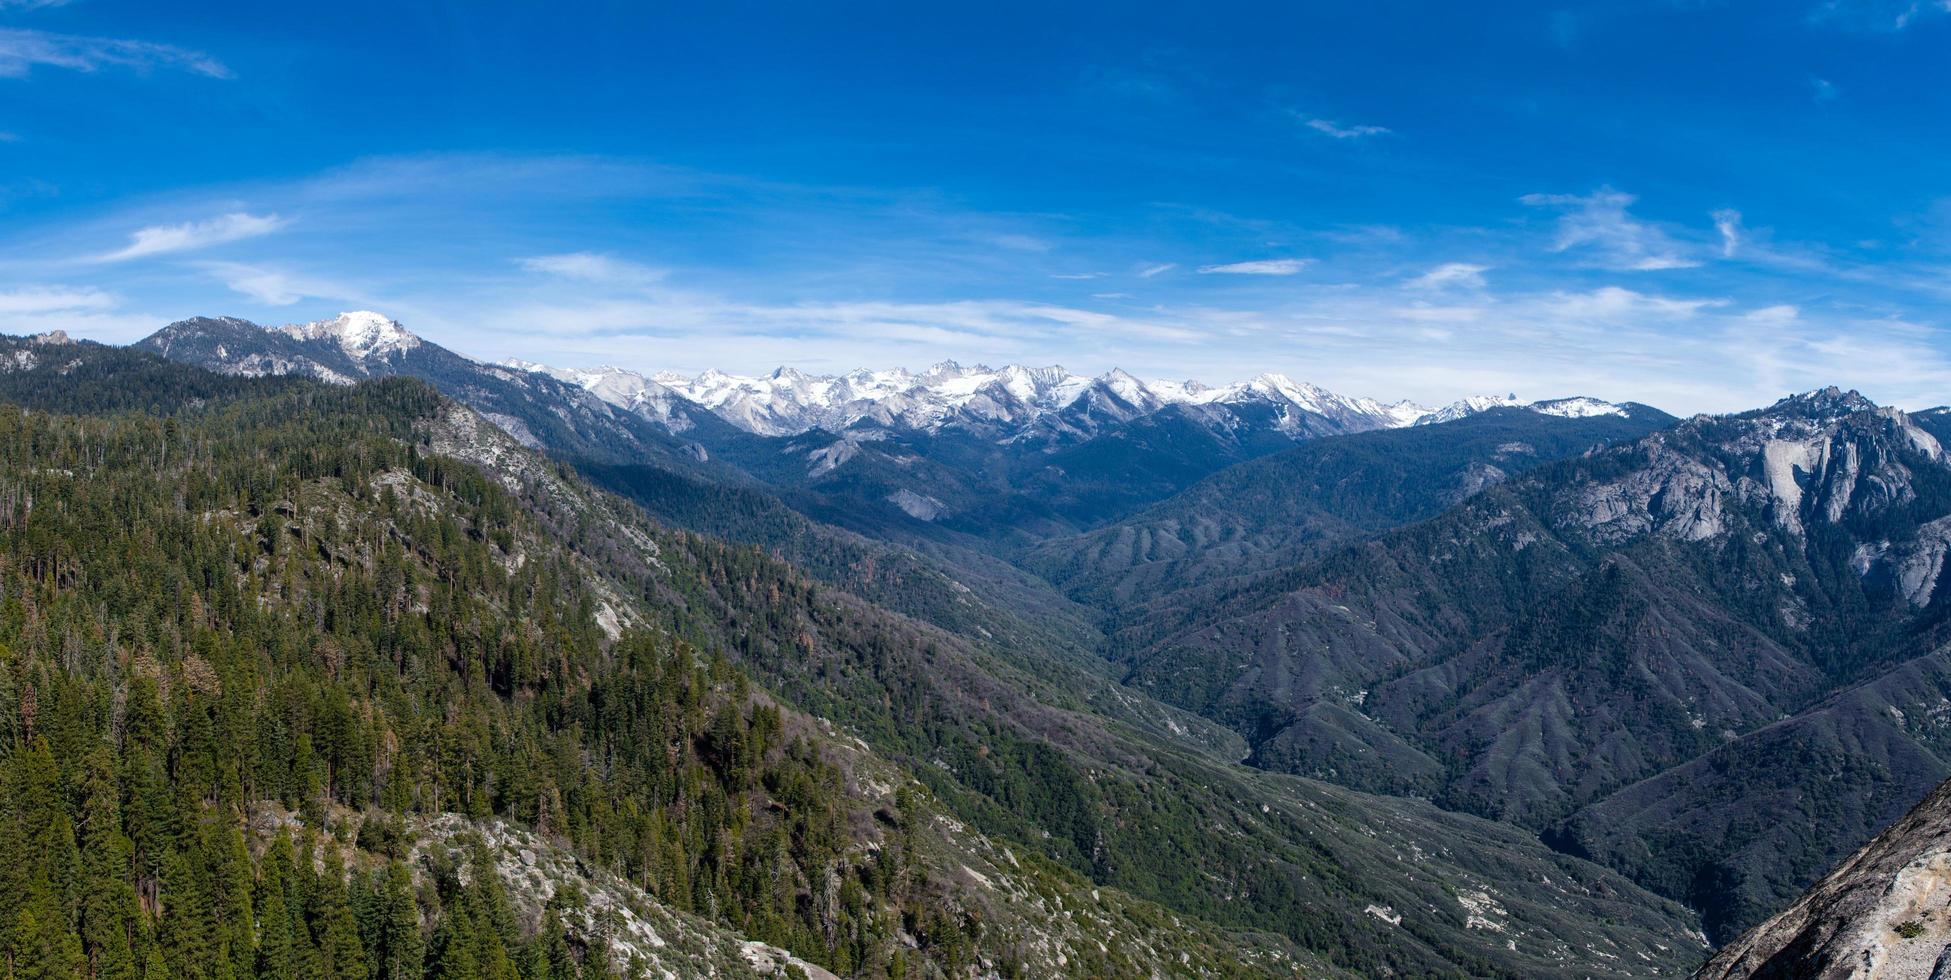 Sequoia Park panorama photo